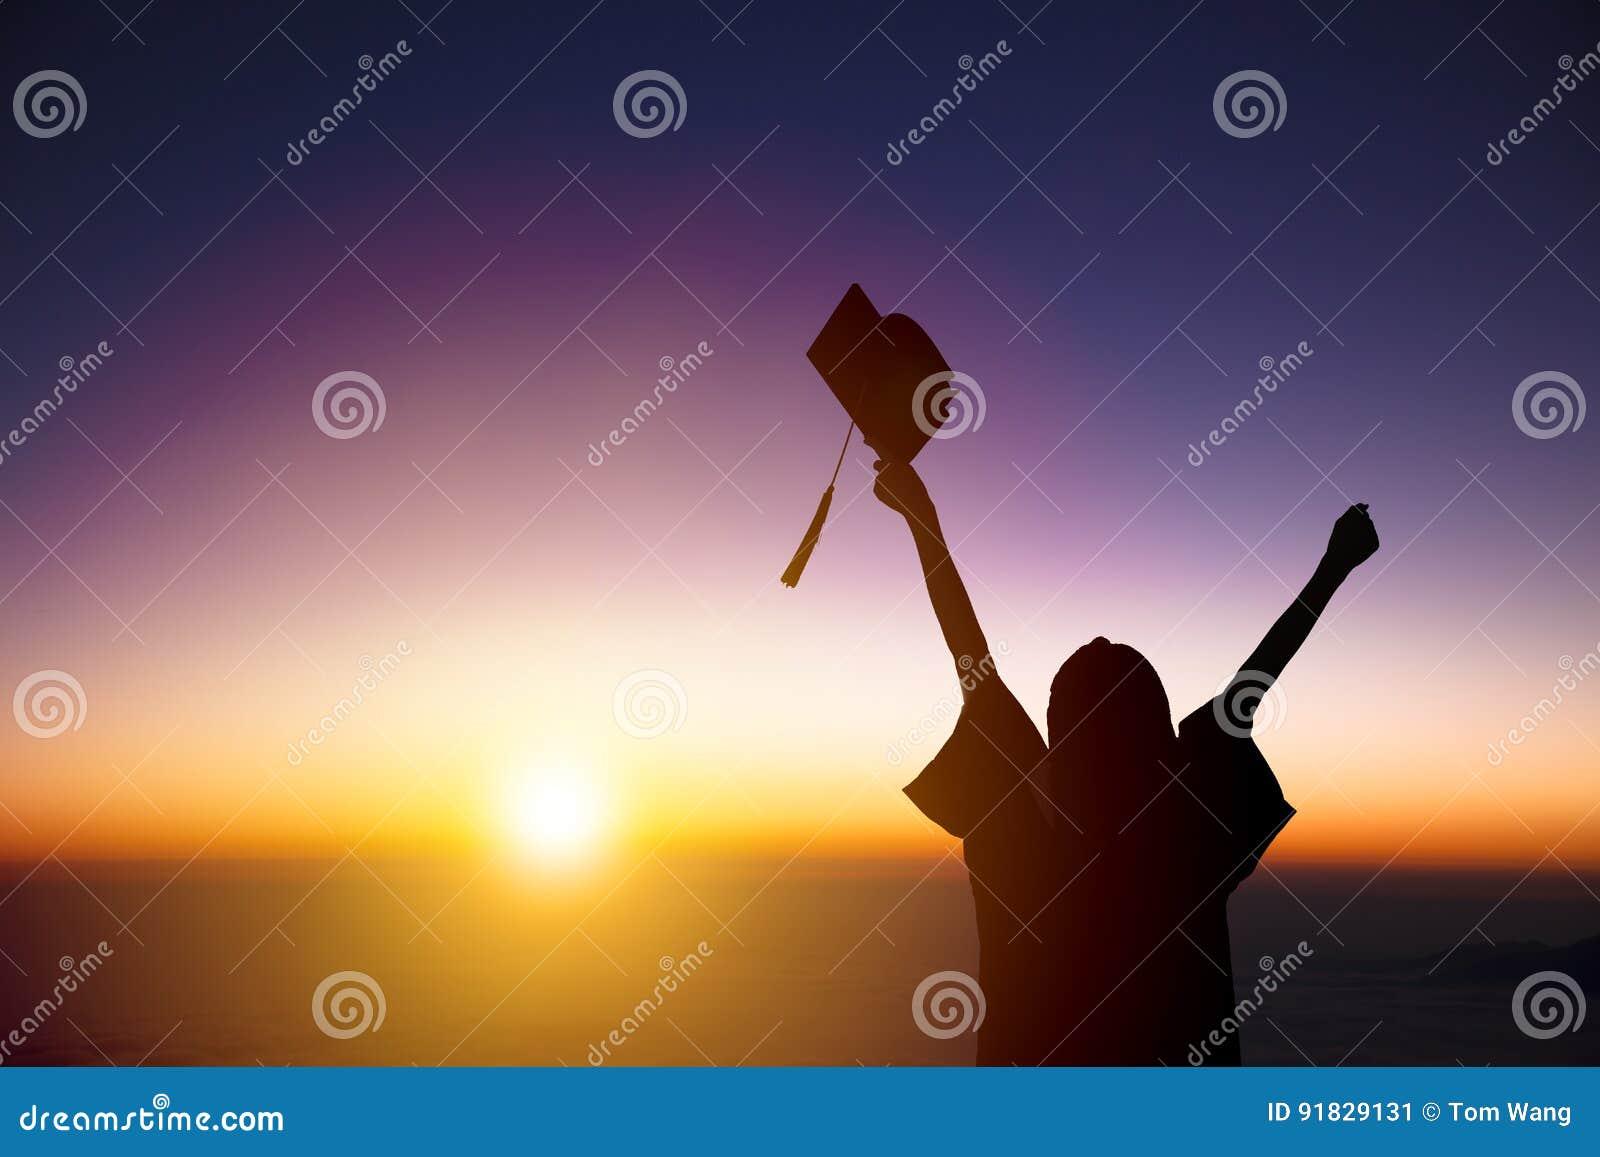 Student Celebrating Graduation watching the sunlight